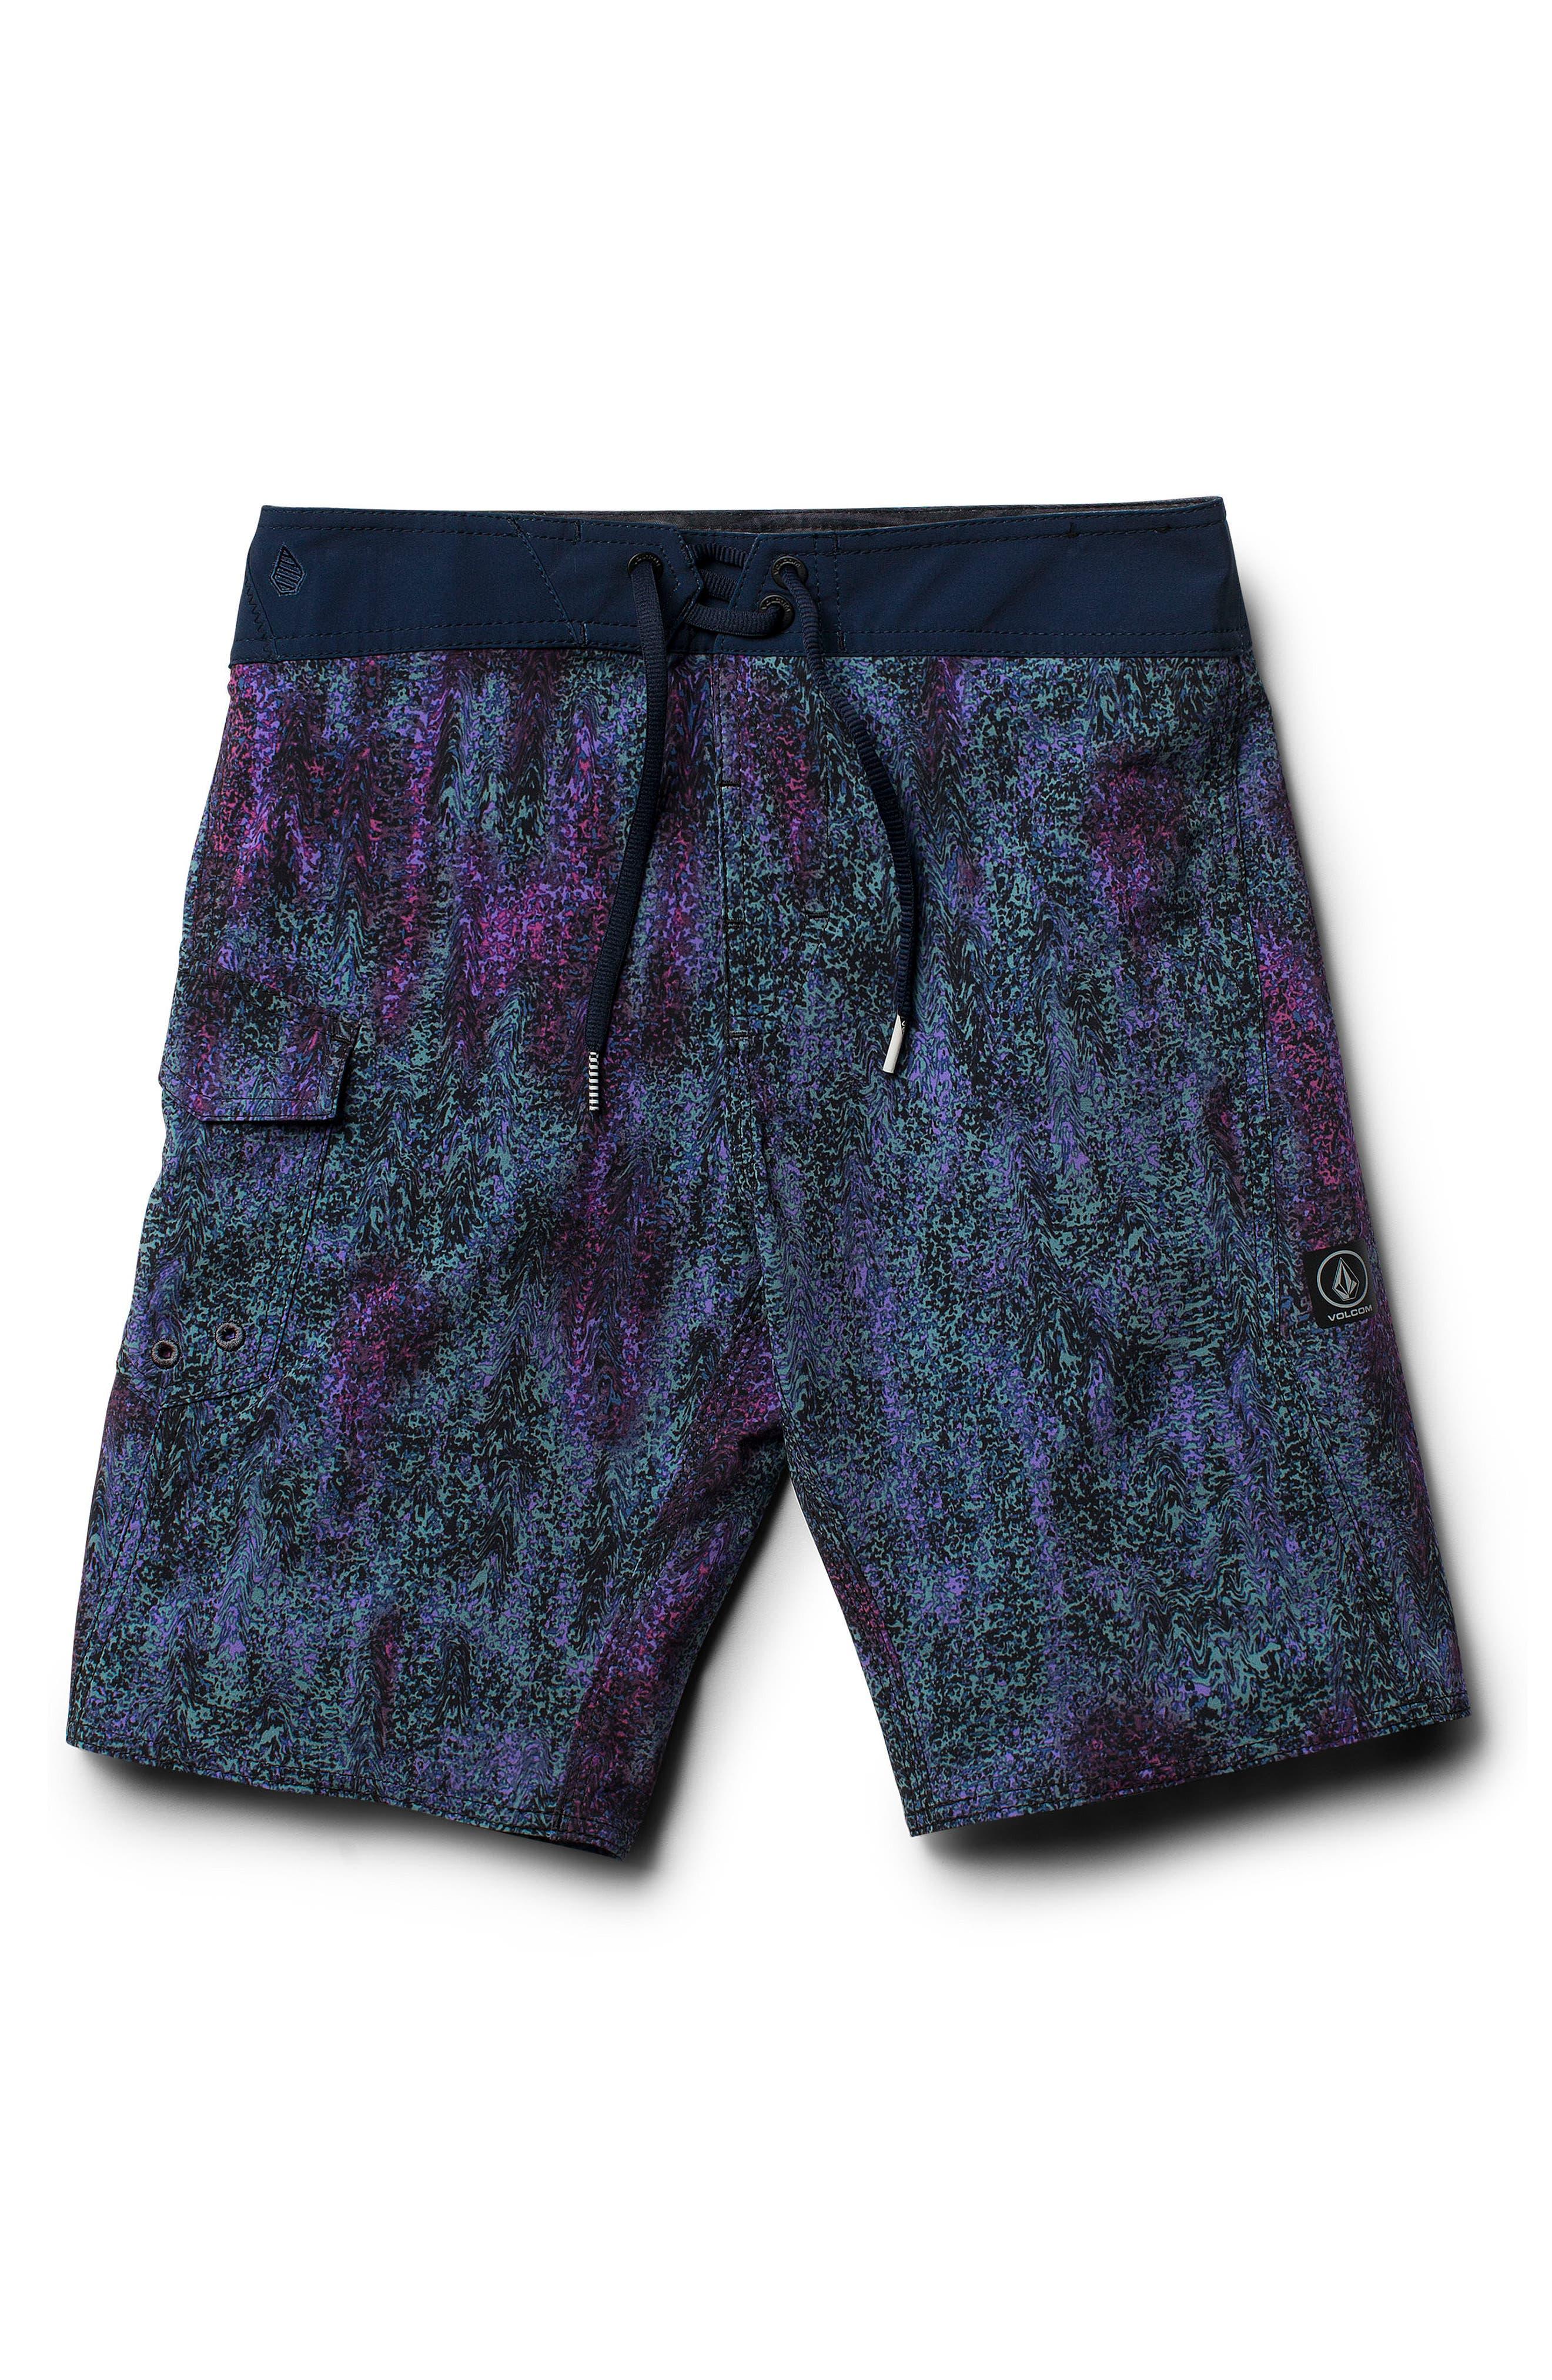 Plasm Mod Board Shorts,                             Main thumbnail 1, color,                             Indigo